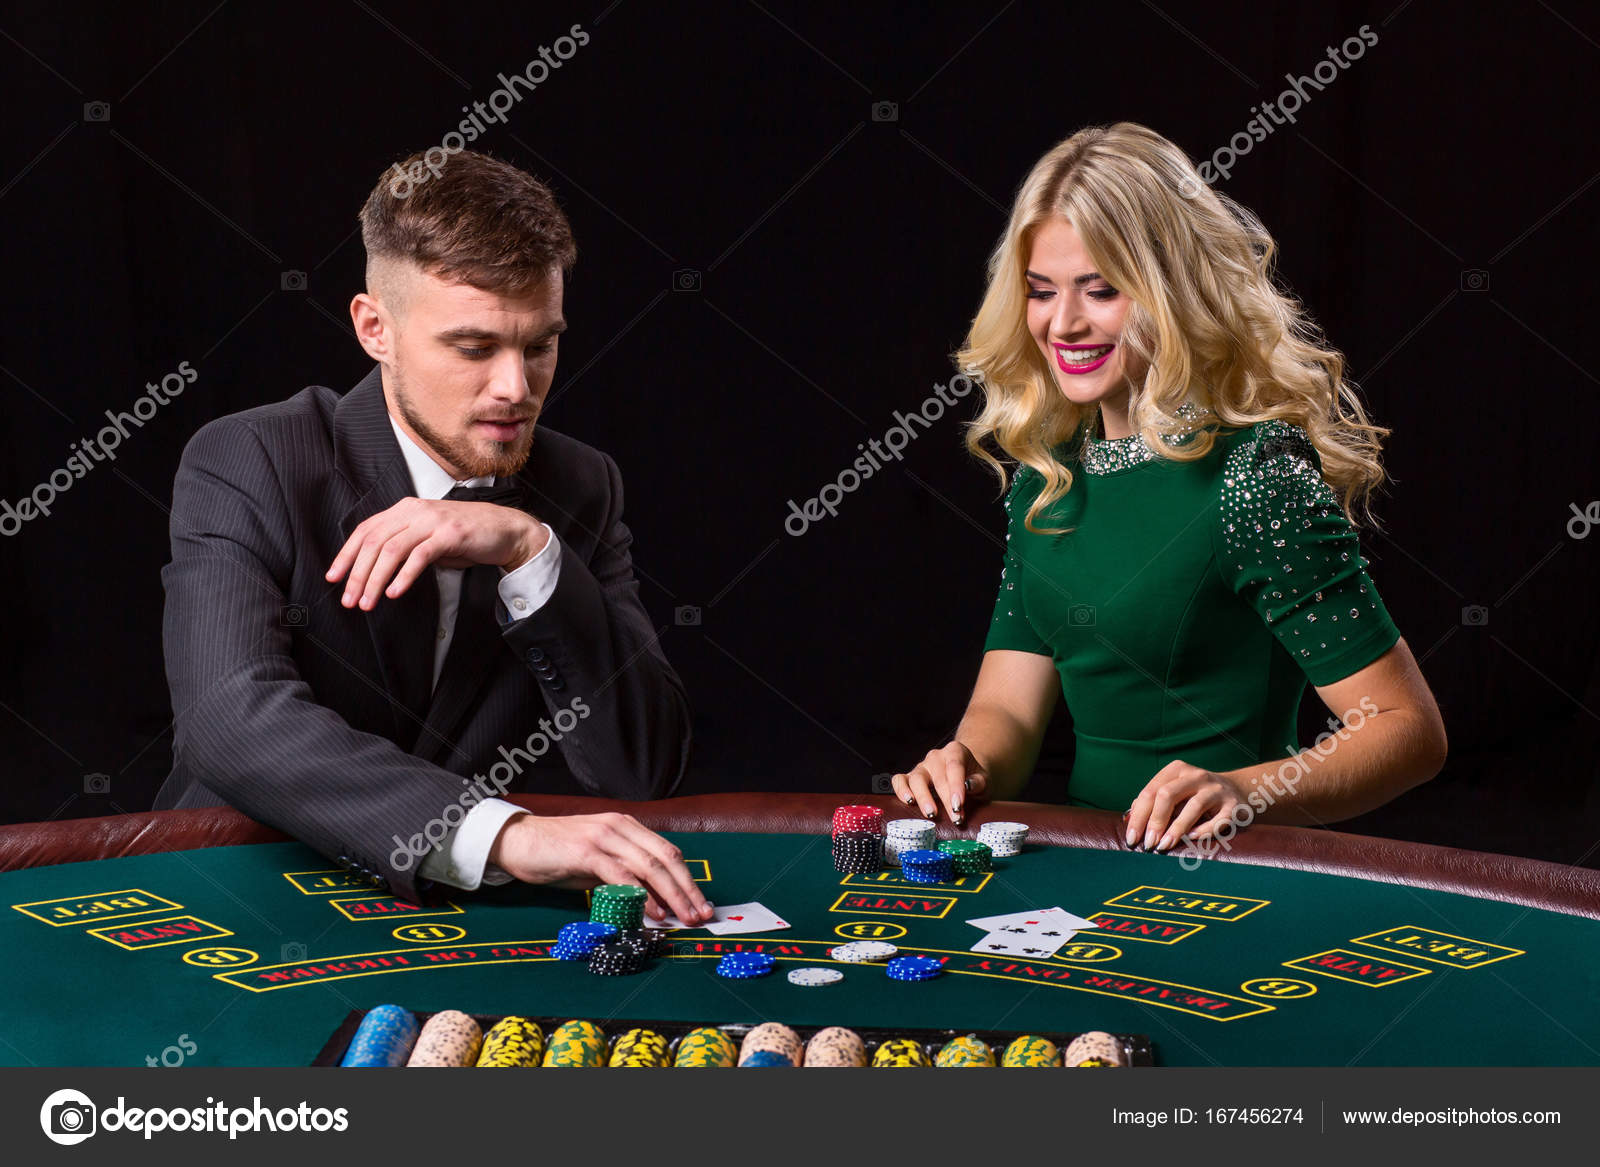 Play for fun poker no download 50 slot teamspeak